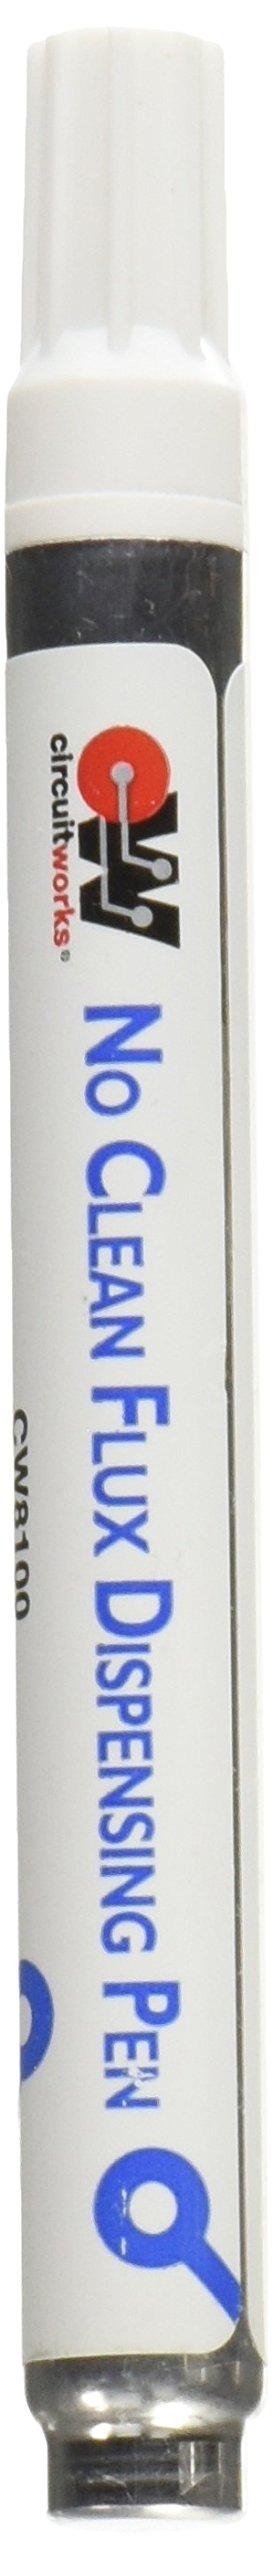 Chemtronics CircuitWorks CW8100 No Clean Flux Dispensing Pen, 9ml